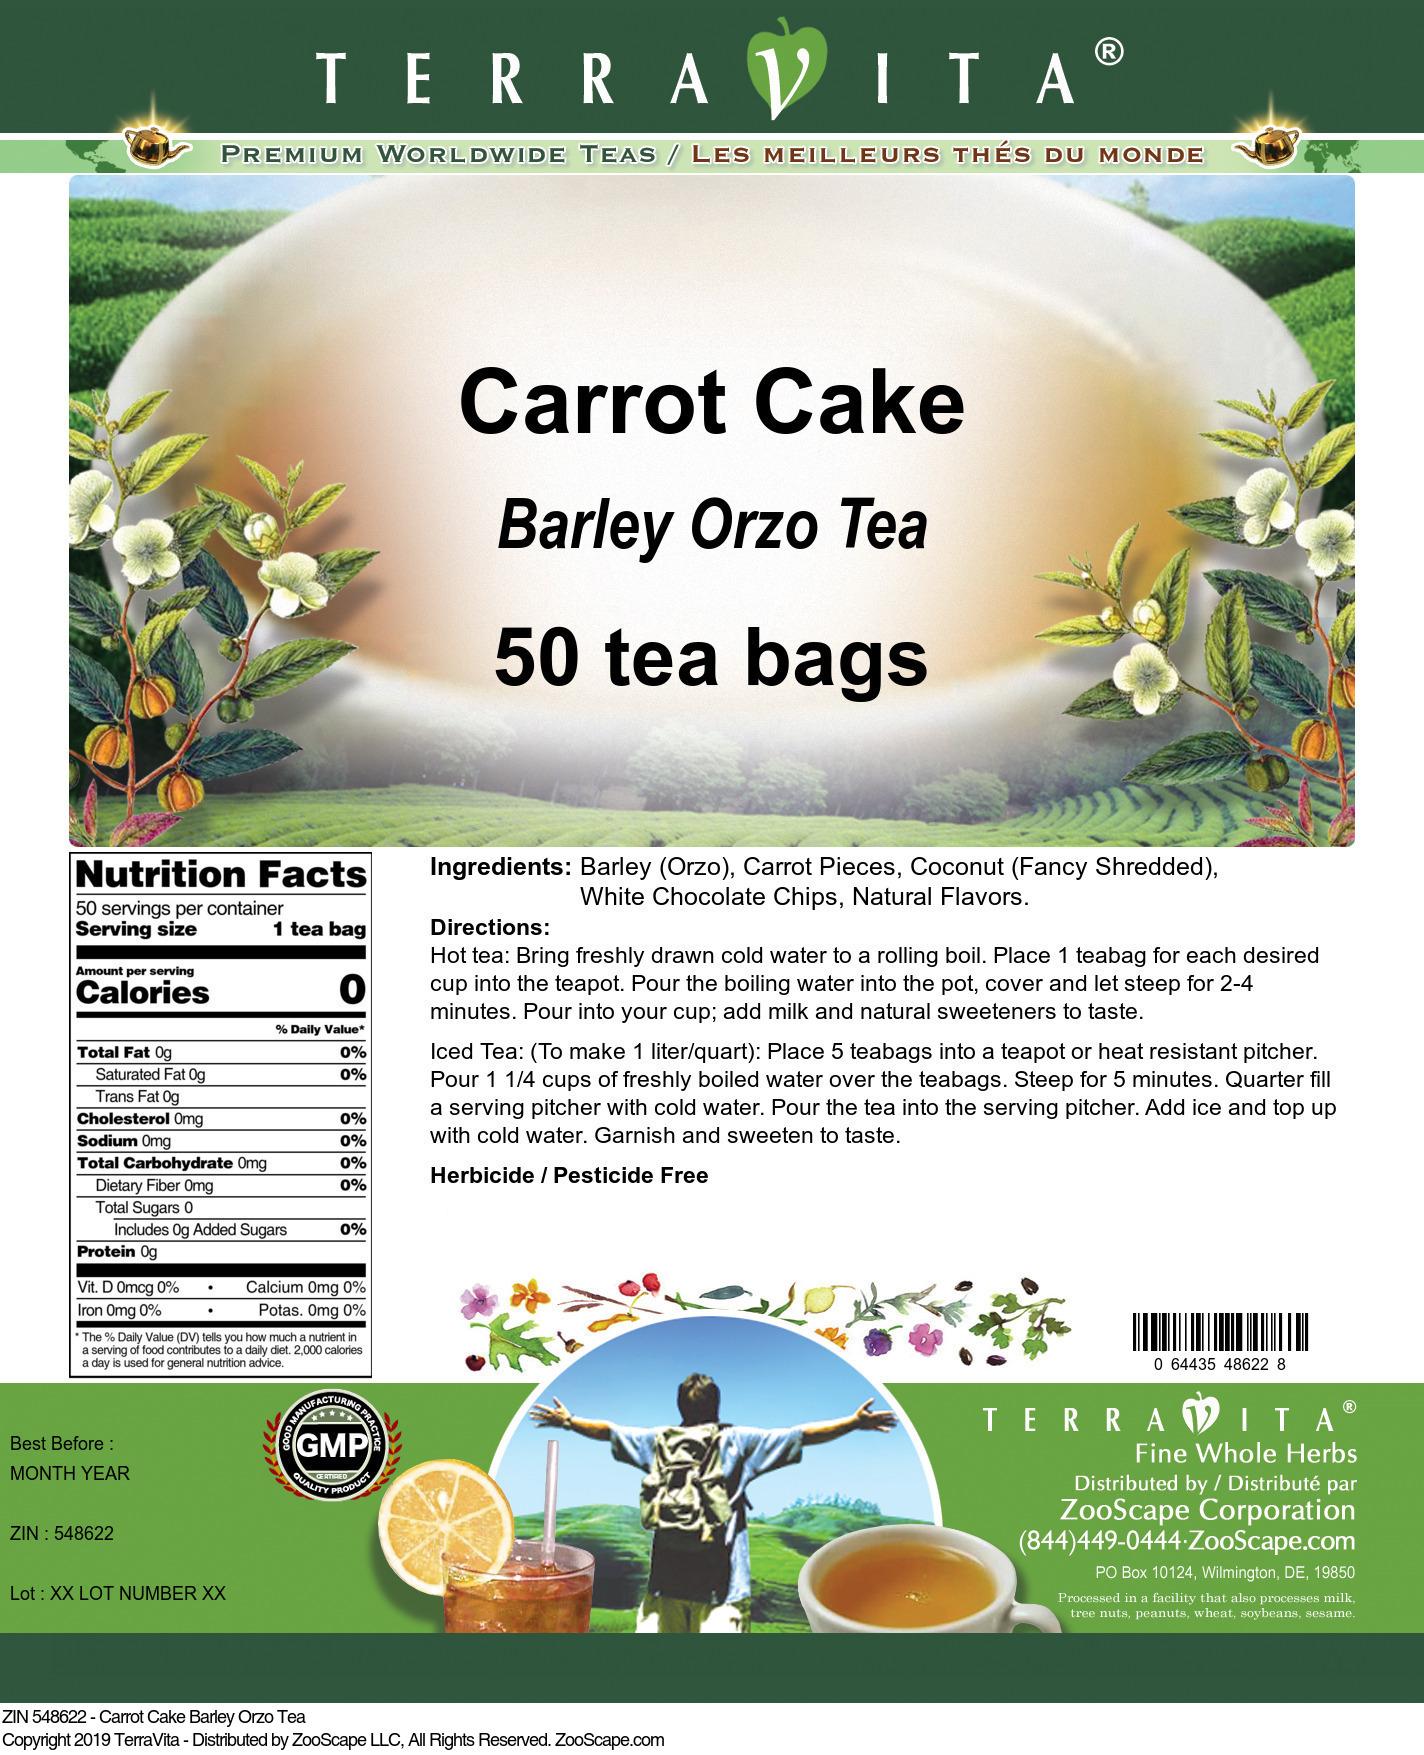 Carrot Cake Barley Orzo Tea